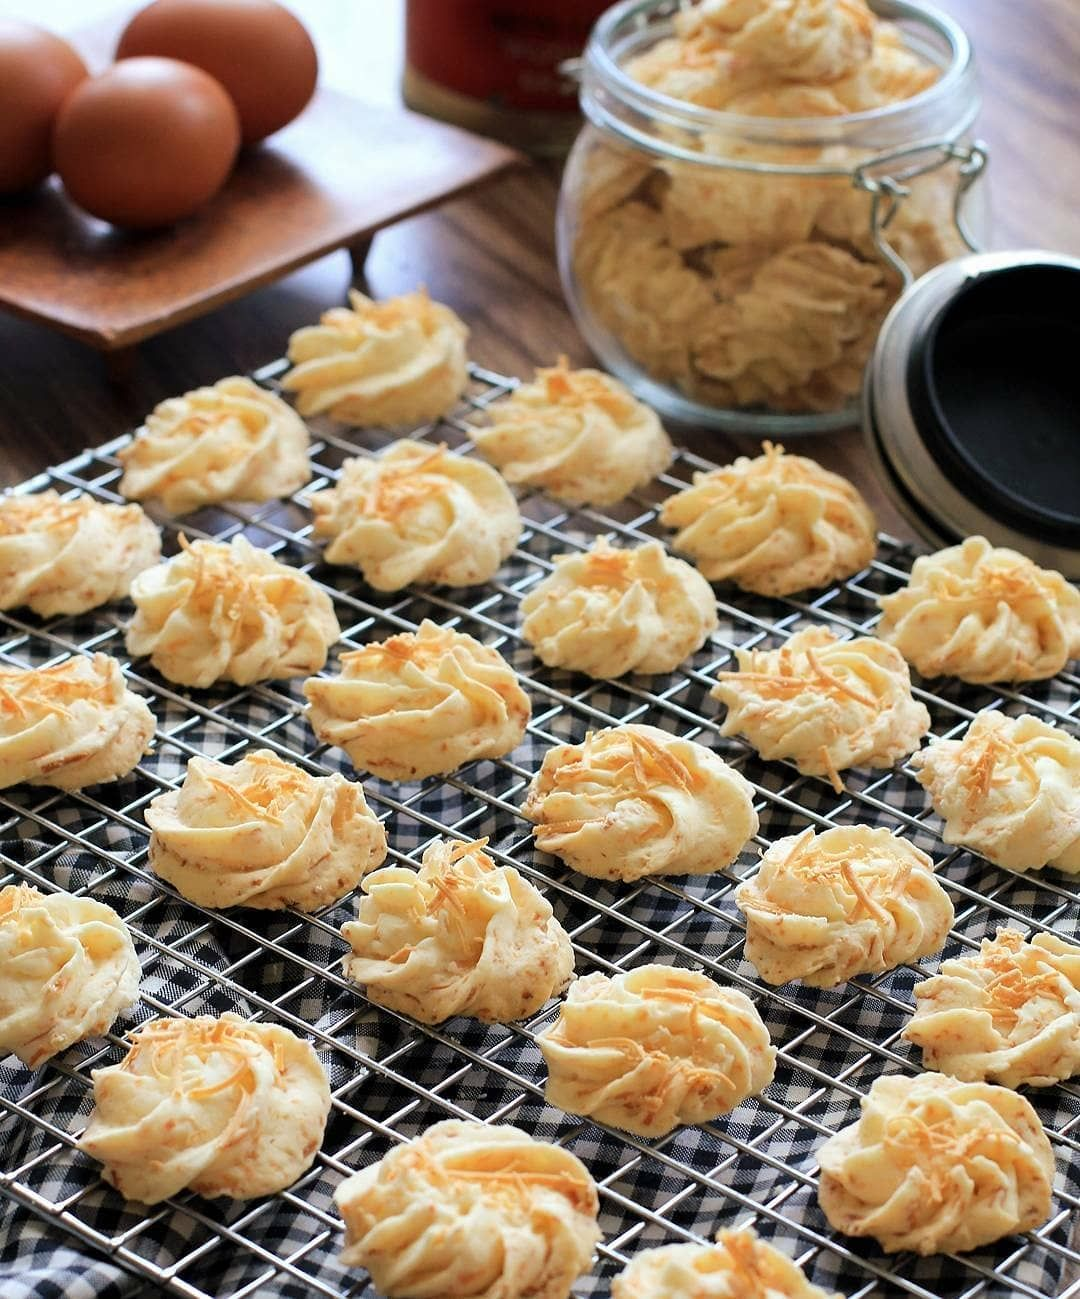 Resep Sagu Keju : resep, Aisyah, Biskut, Raya/Lebaran(Hari, Cookies), Resep, Keju,